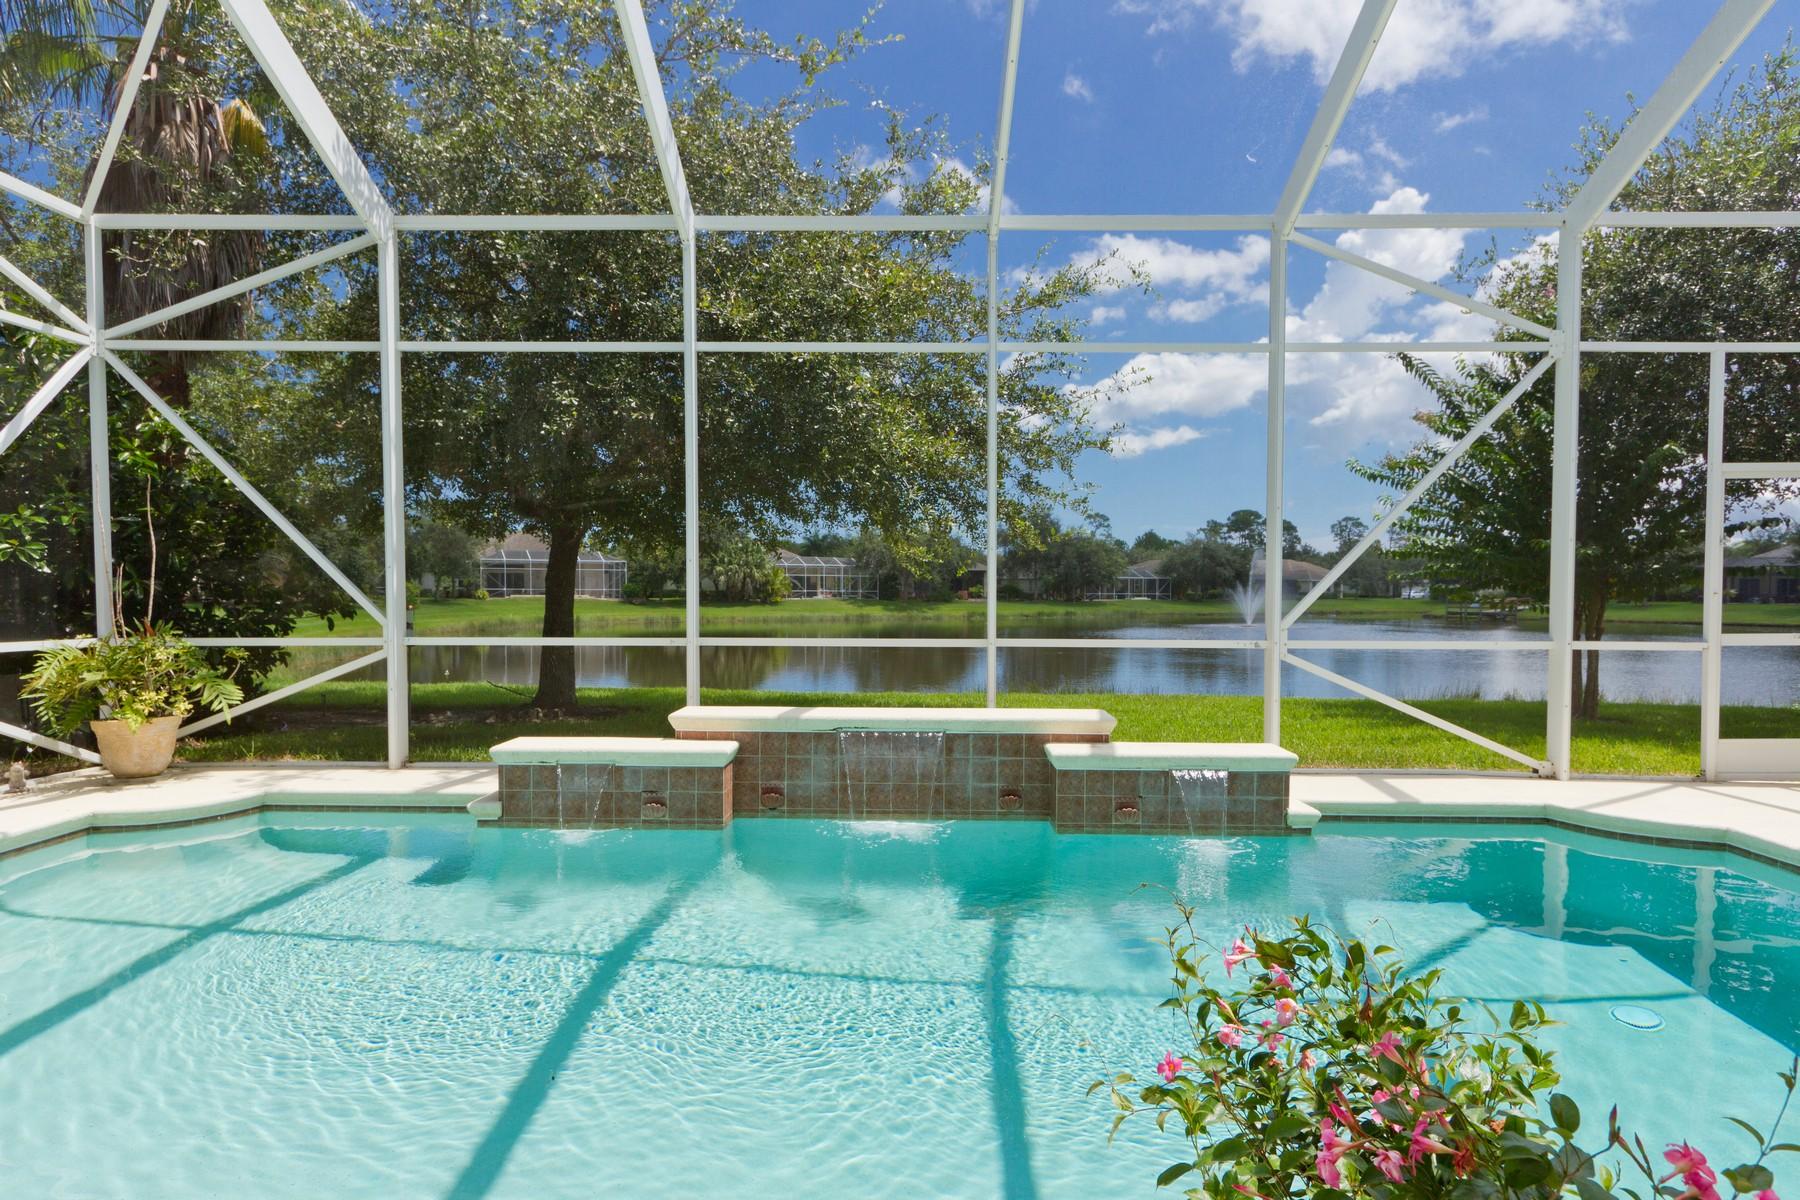 Single Family Homes for Sale at Grand Lakeside Pool Home 4156 Abington Woods Circle Vero Beach, Florida 32967 United States